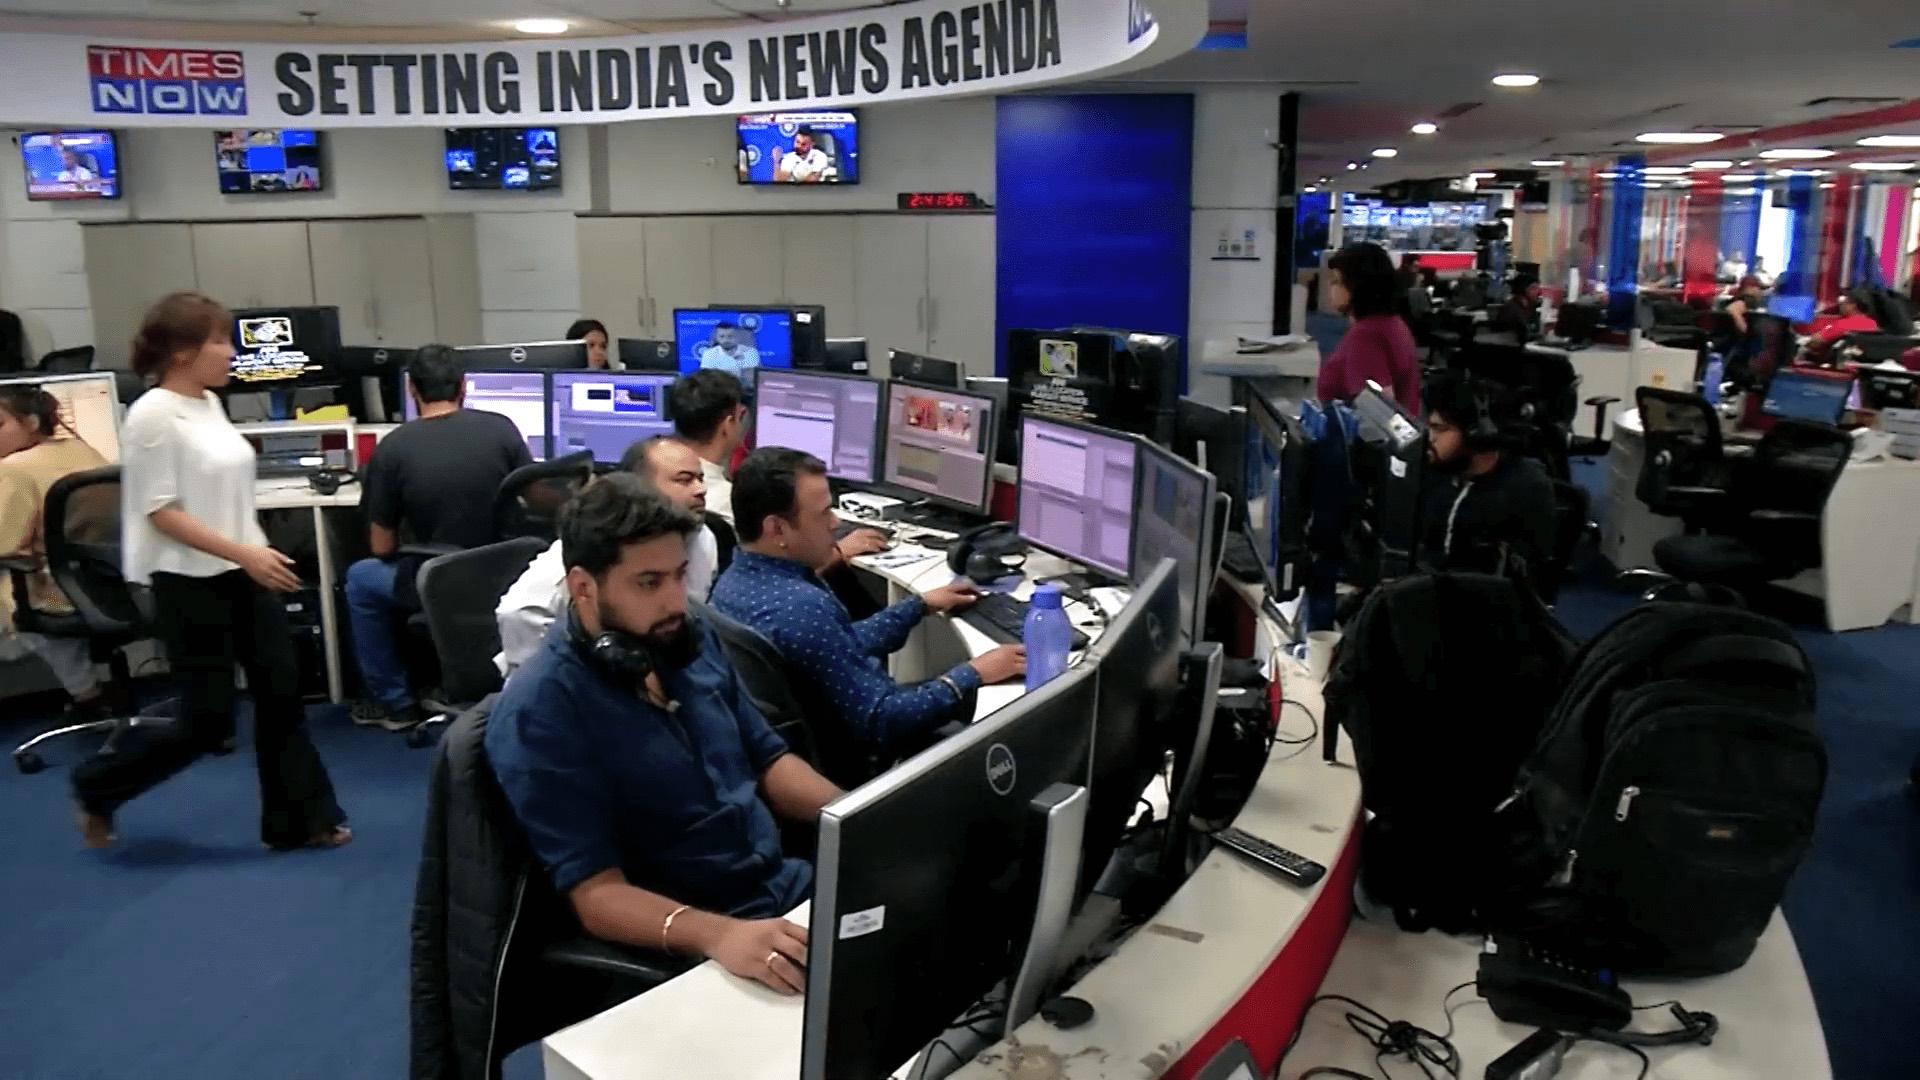 Times Now Newsroom